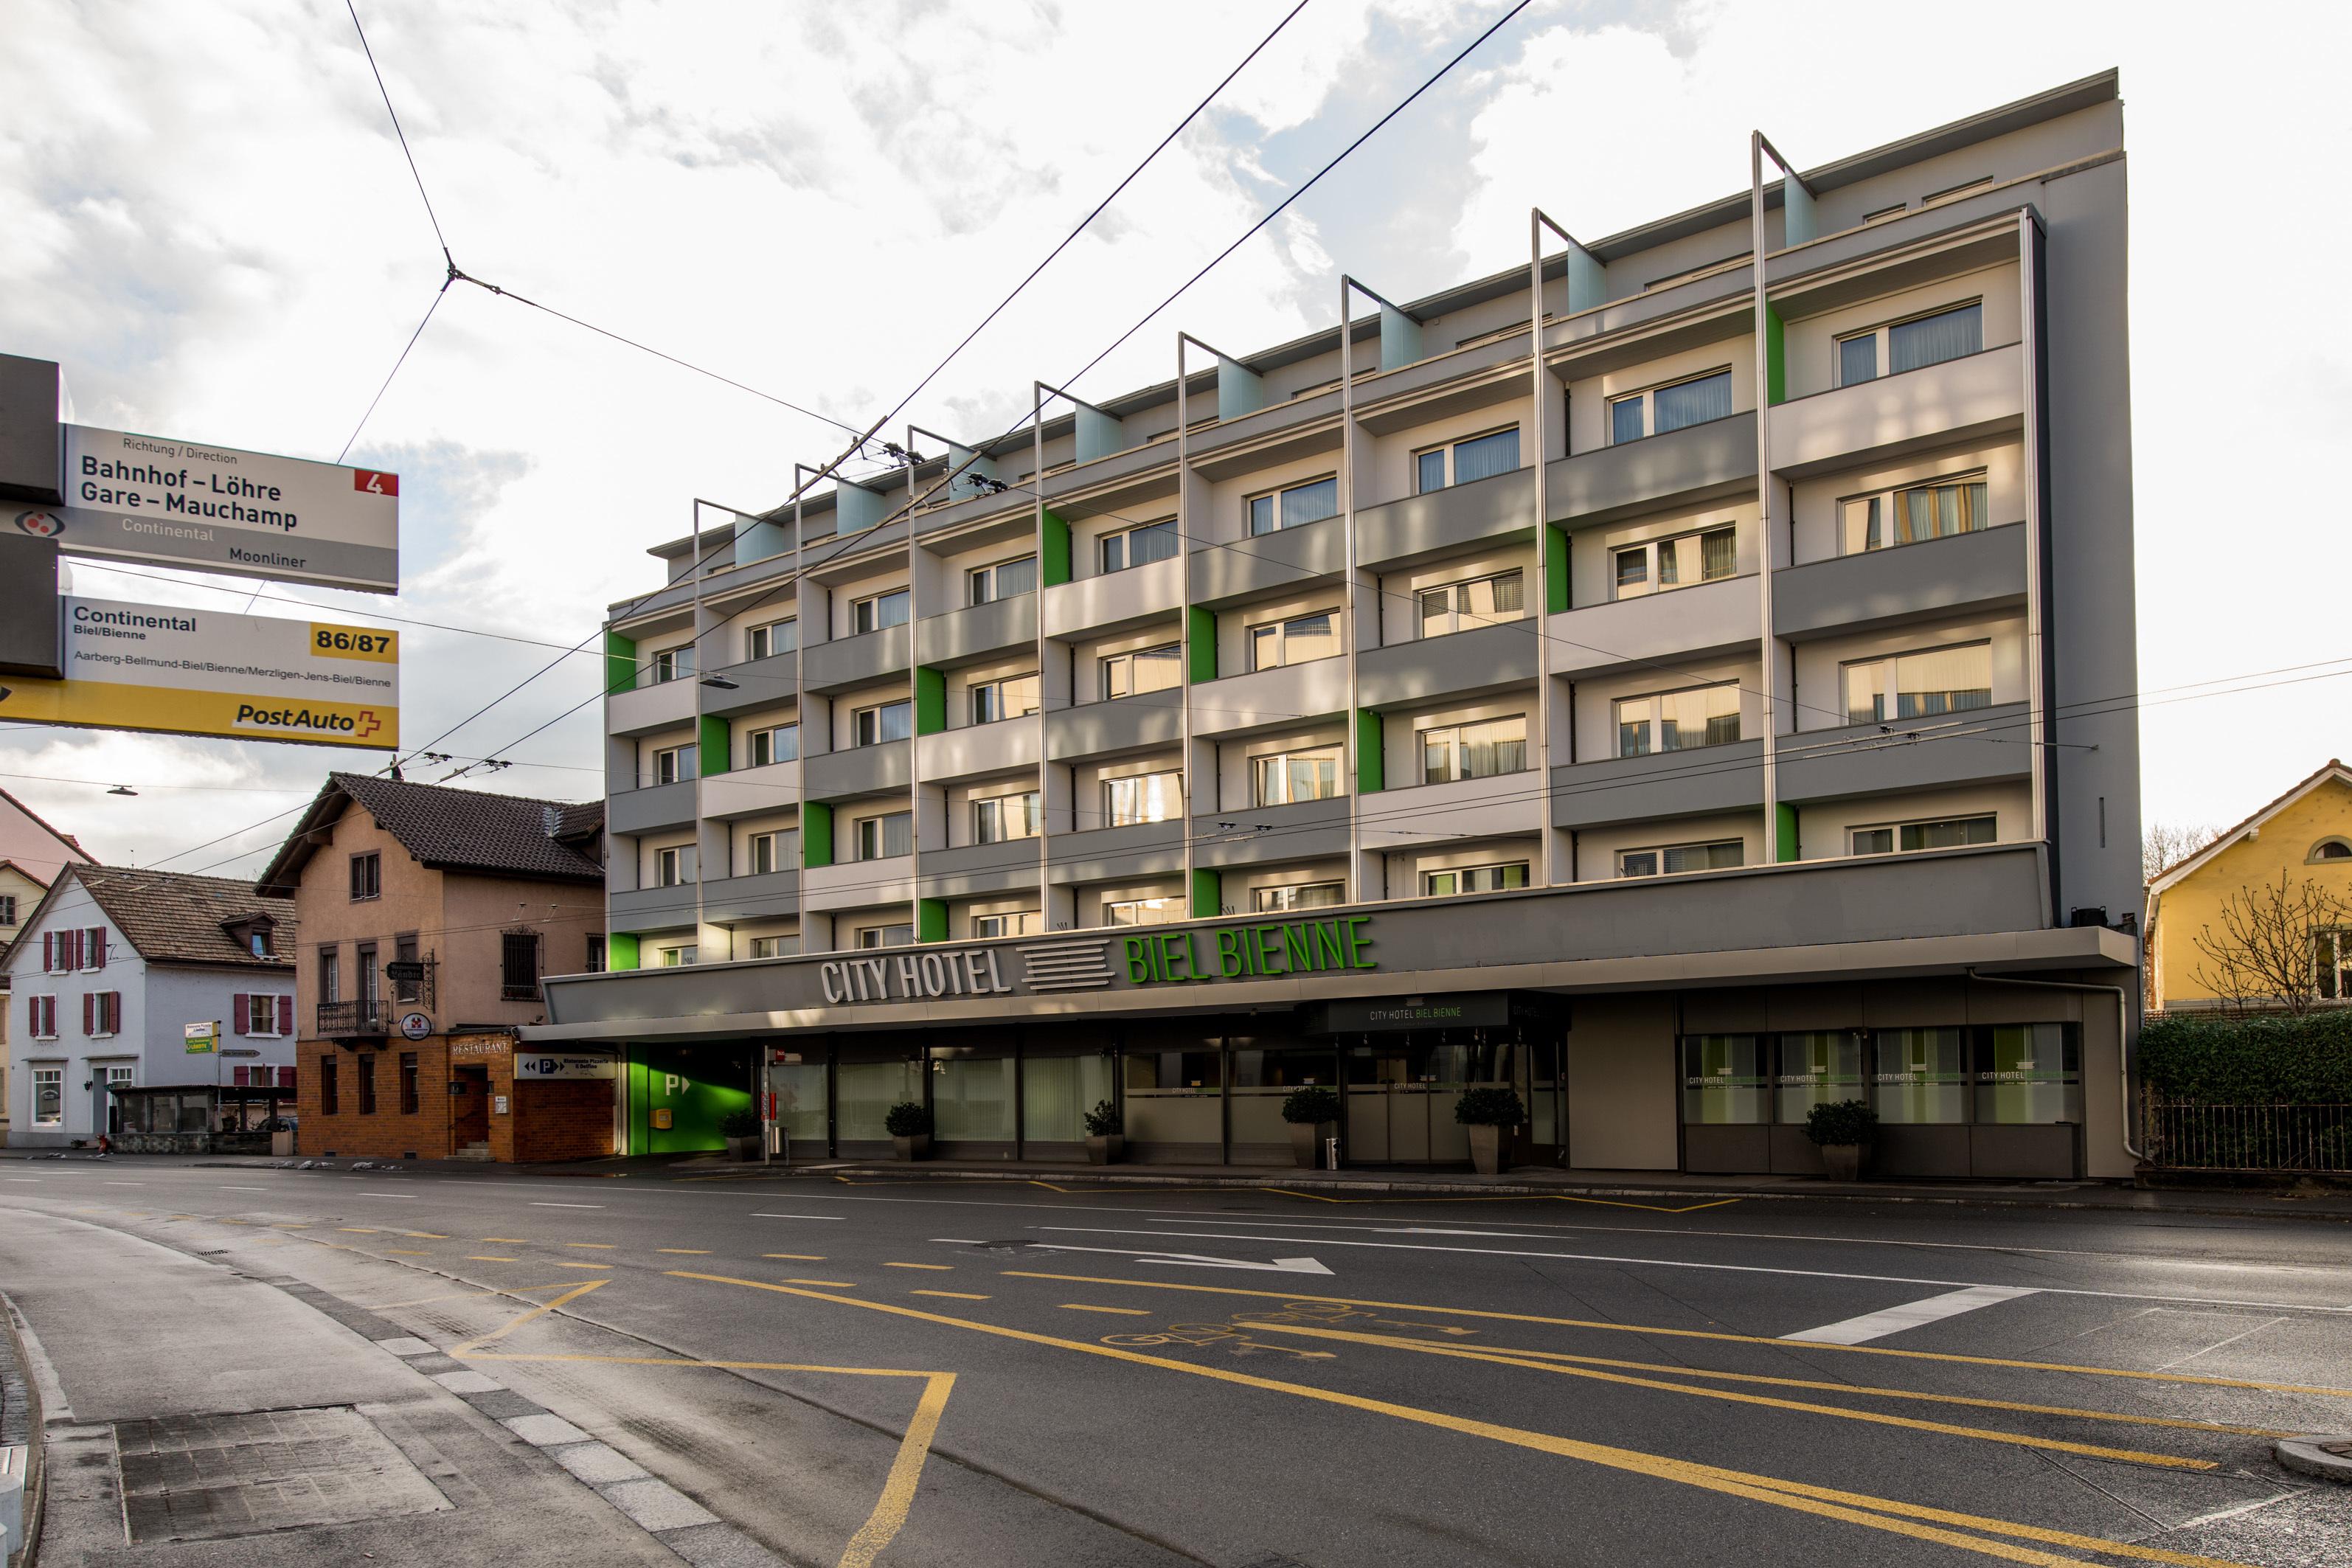 City hotel biel bienne biel bienne 장소 찾기 스위스정부관광청